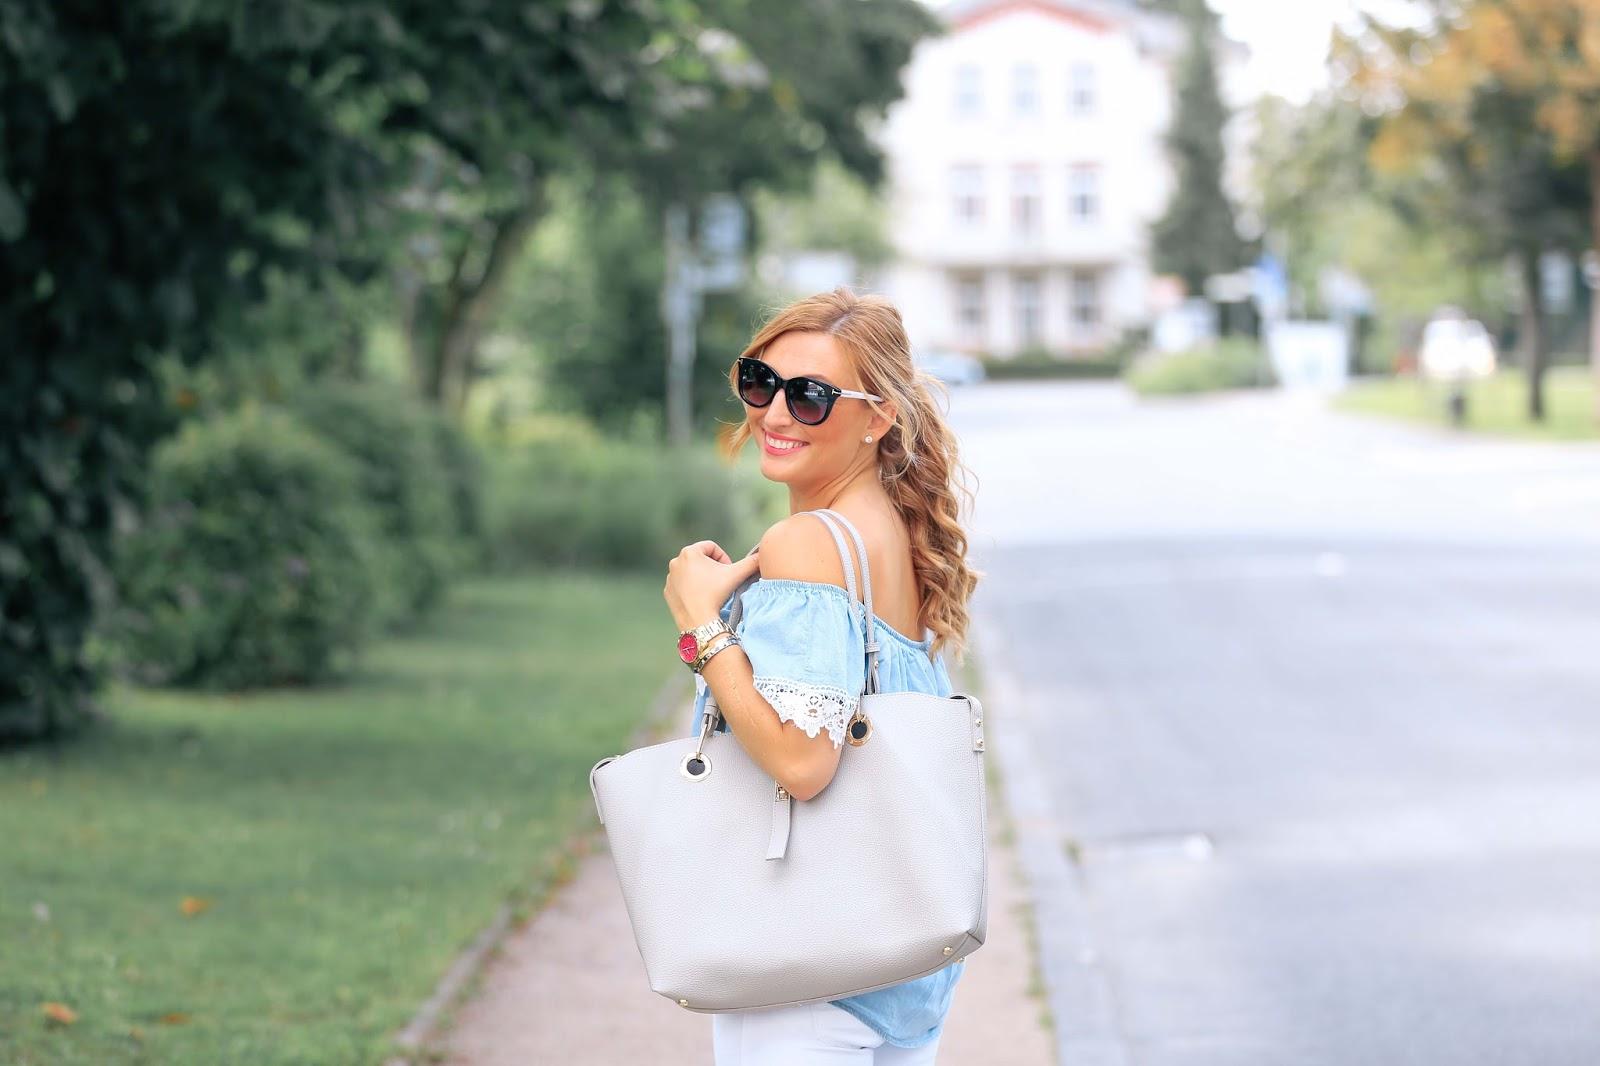 fashionblog-muenchen-styleblog-frankfurt-blogger-deutschland-fashionblogger-bloggerdeutschland-lifestyleblog-modeblog-shopper-bloggerstyle